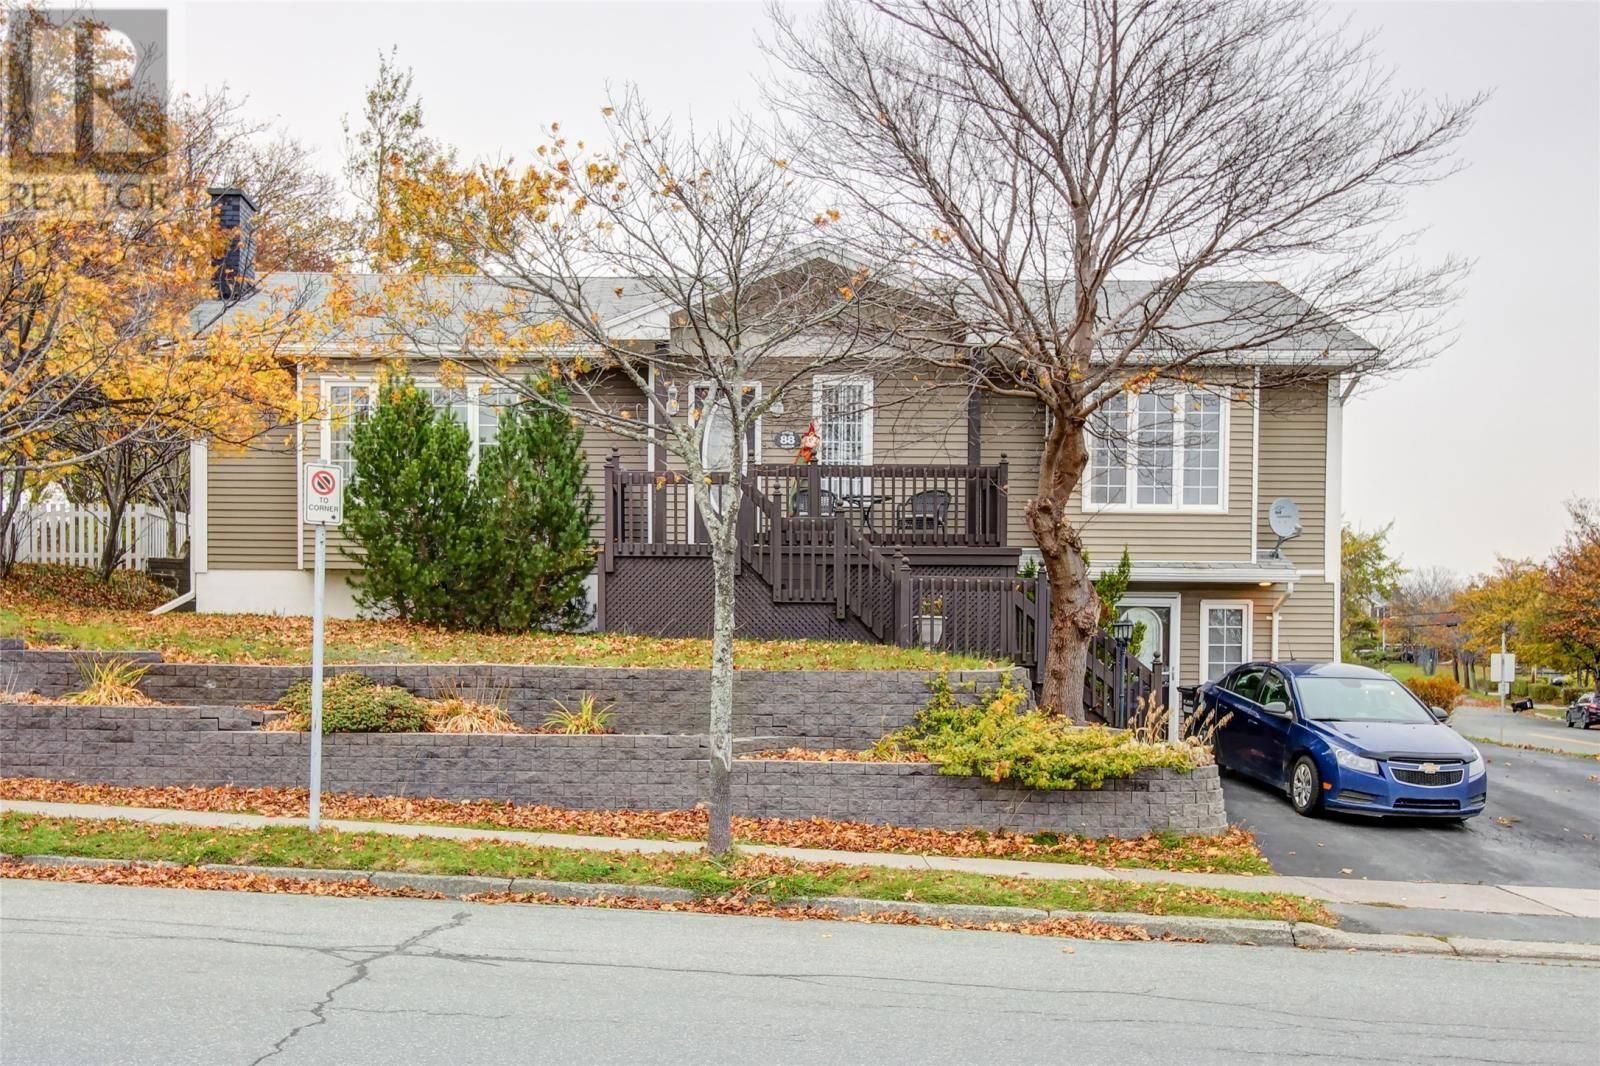 House for sale at 88 Ennis Ave St. John's Newfoundland - MLS: 1205689